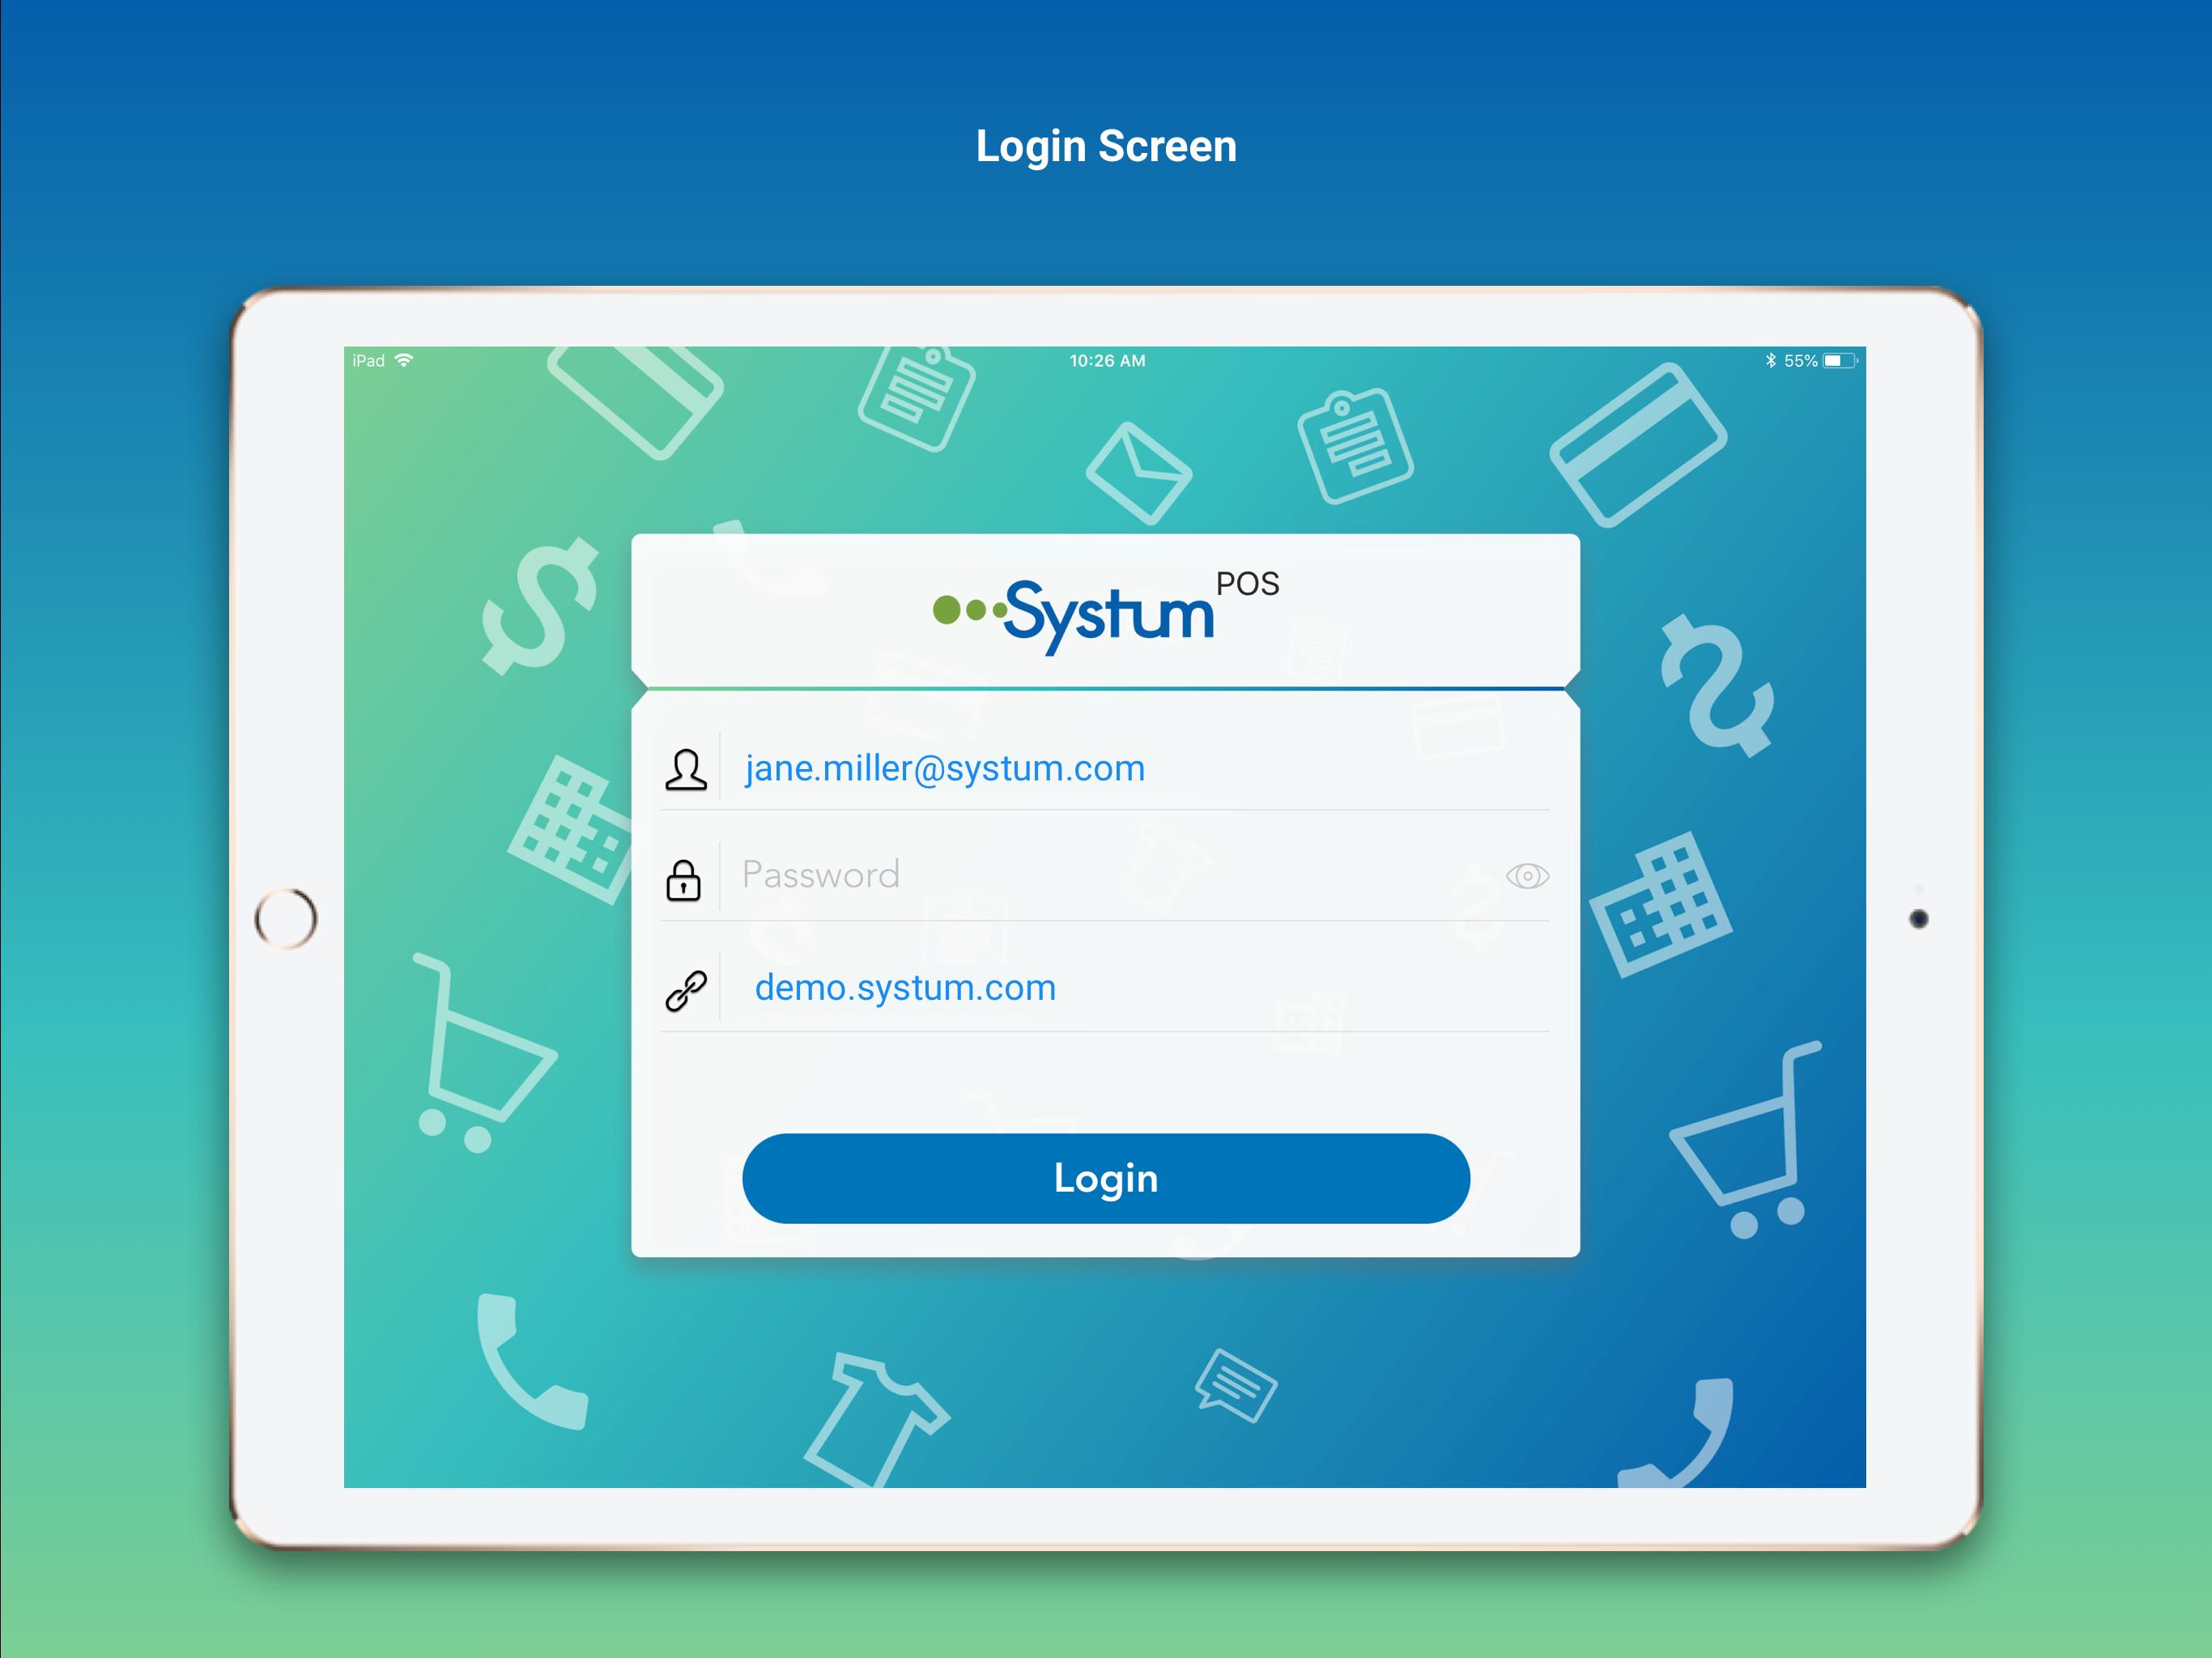 Systum login screen screenshot